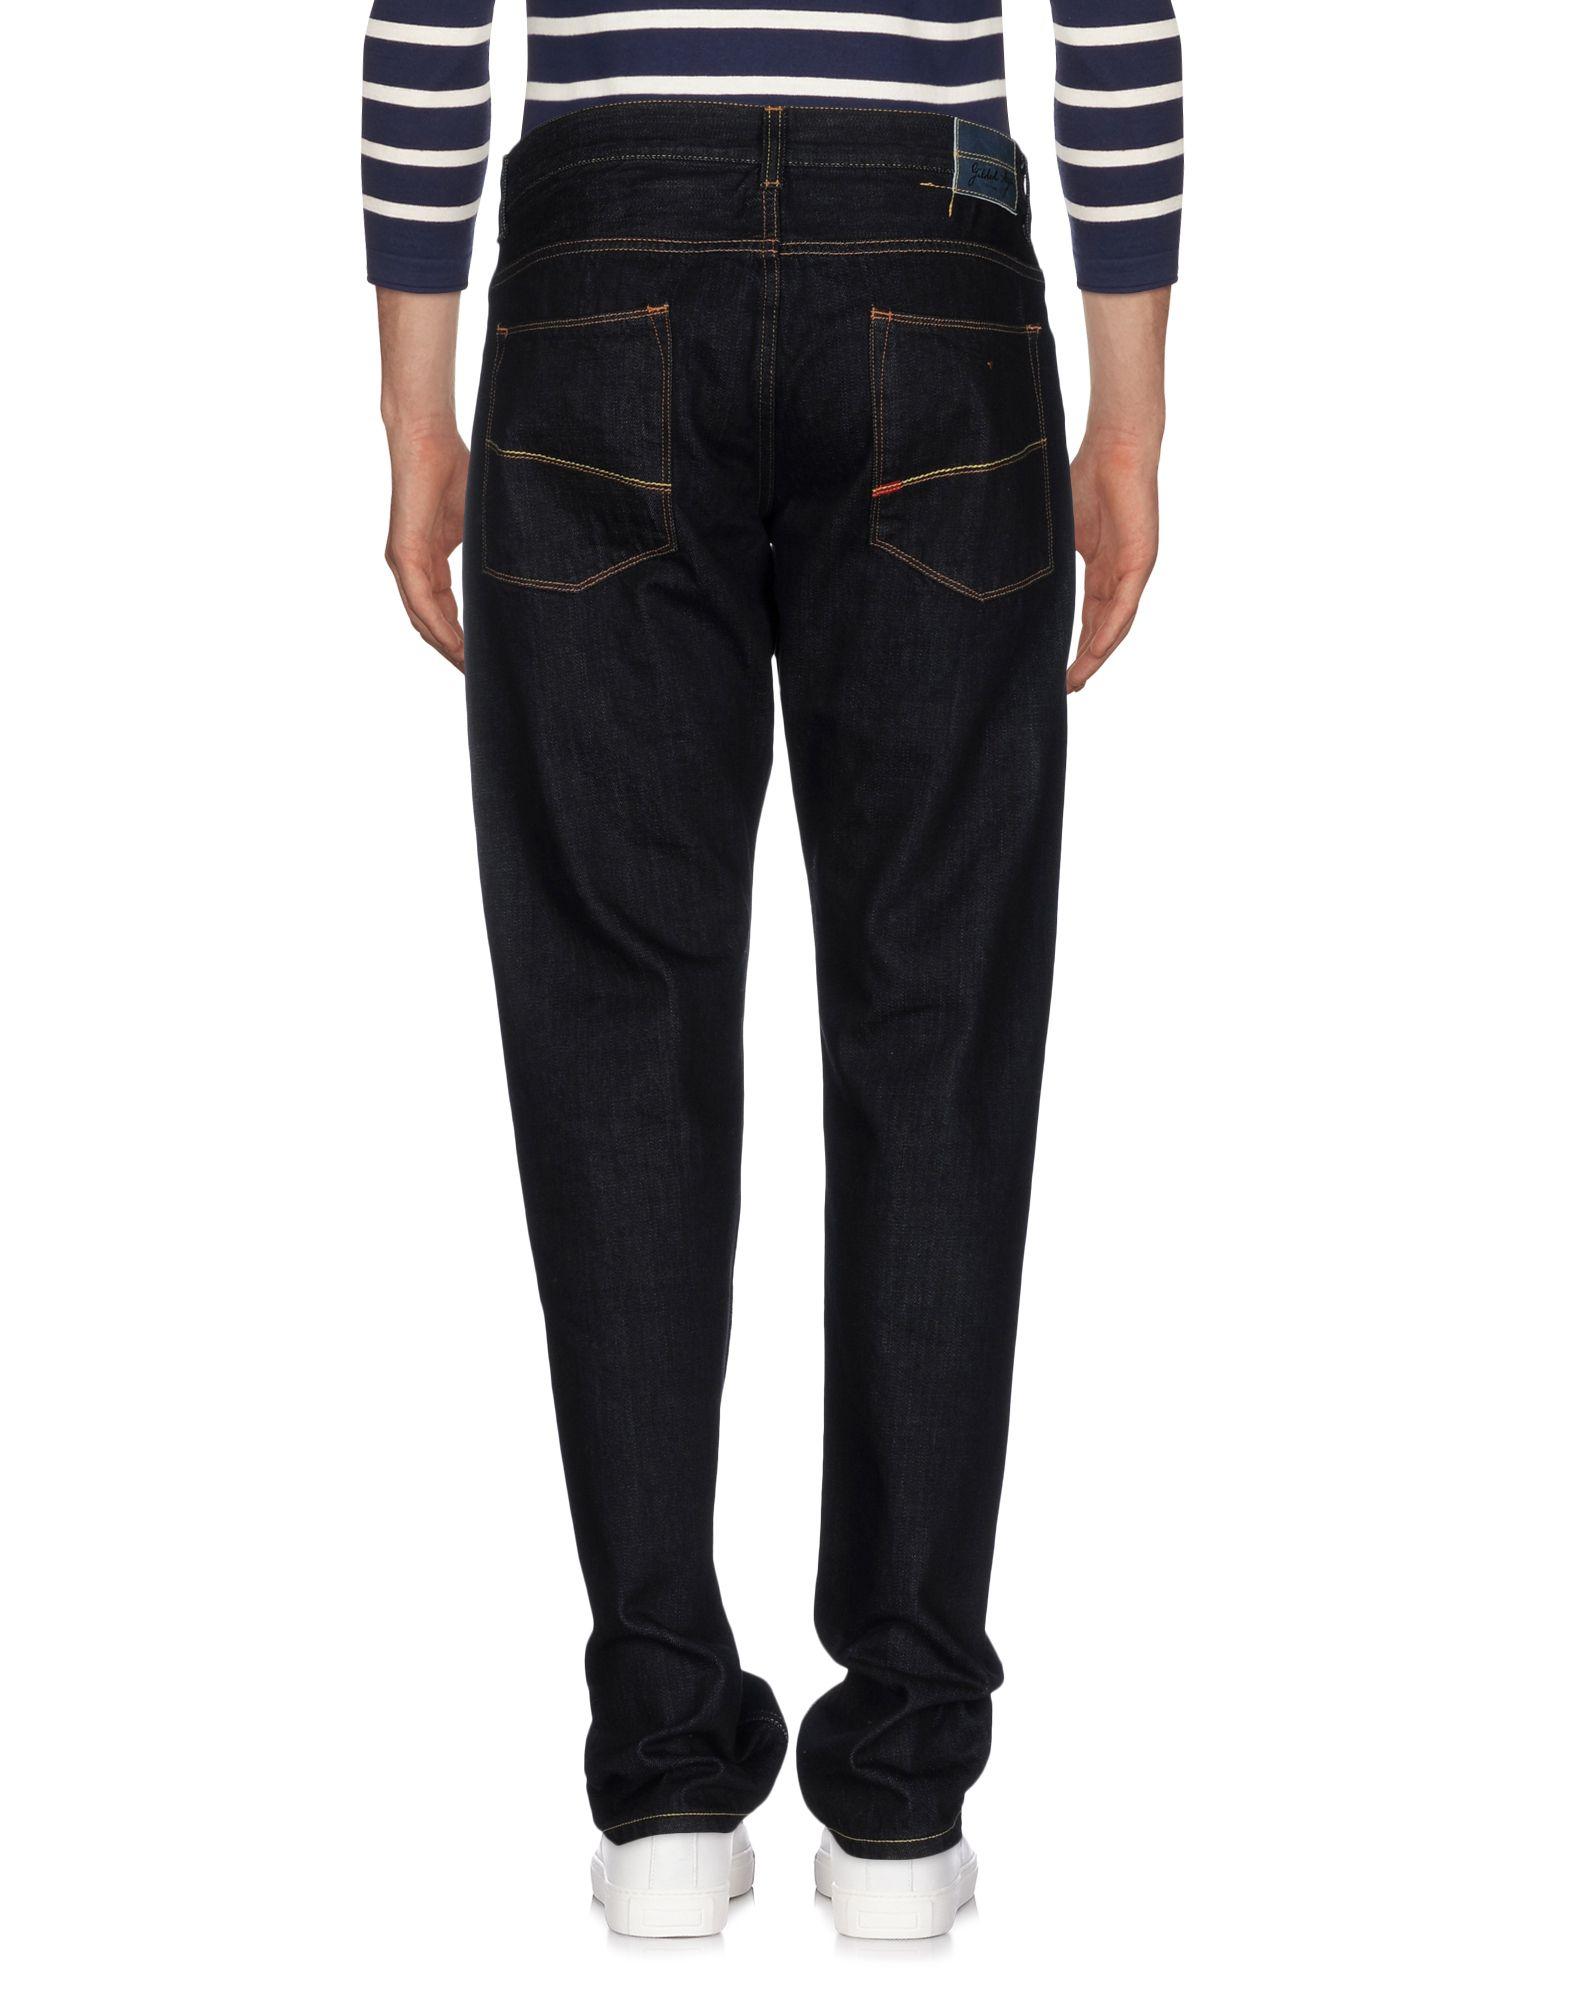 Pantaloni Jeans Gilded Age Uomo - 42649524JN 42649524JN - ff18f9